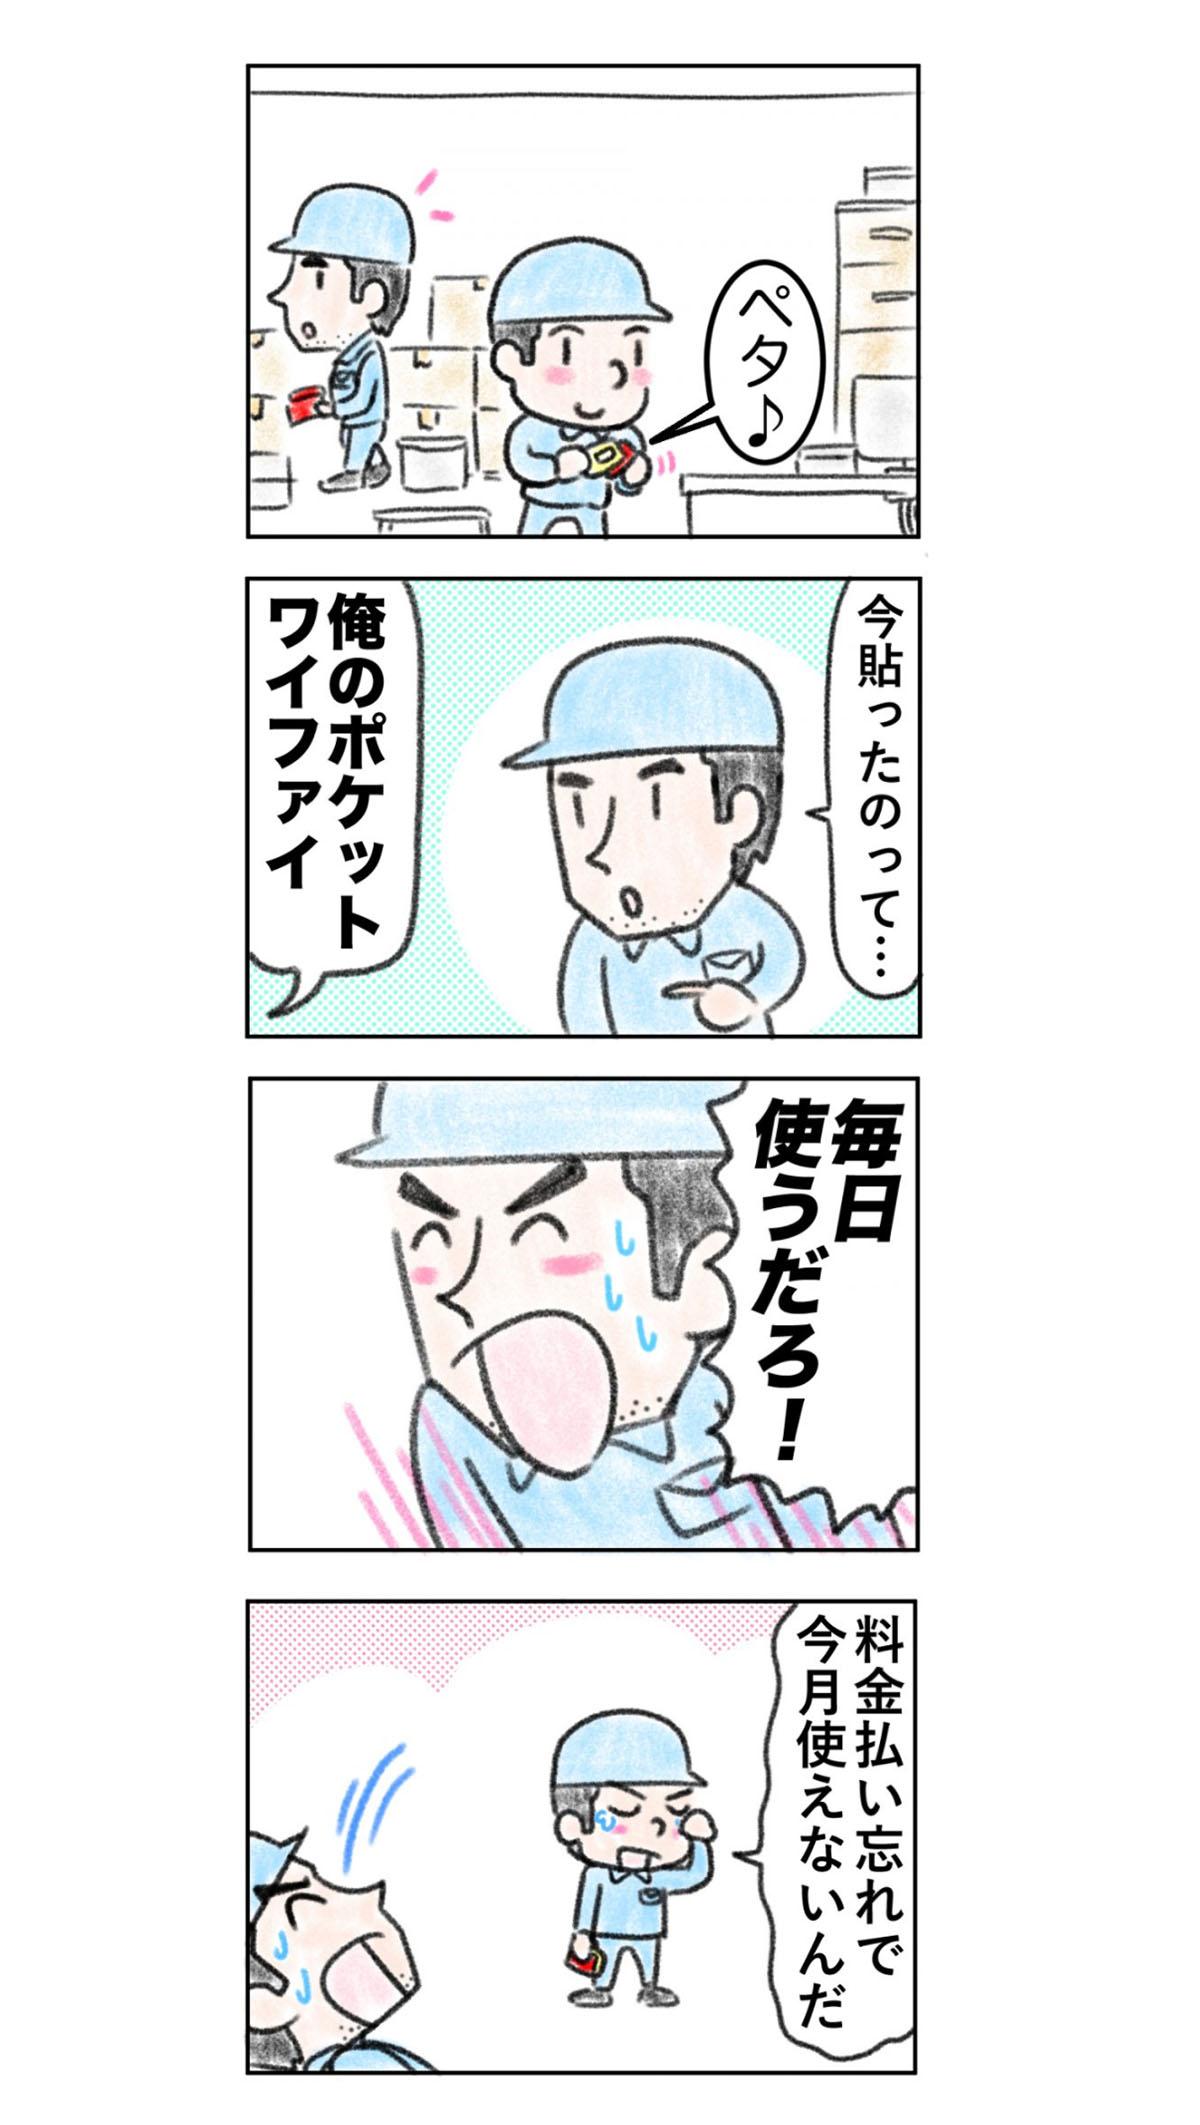 screencapture-kakiuchikaizen-archives-203-1490779017184のコピー